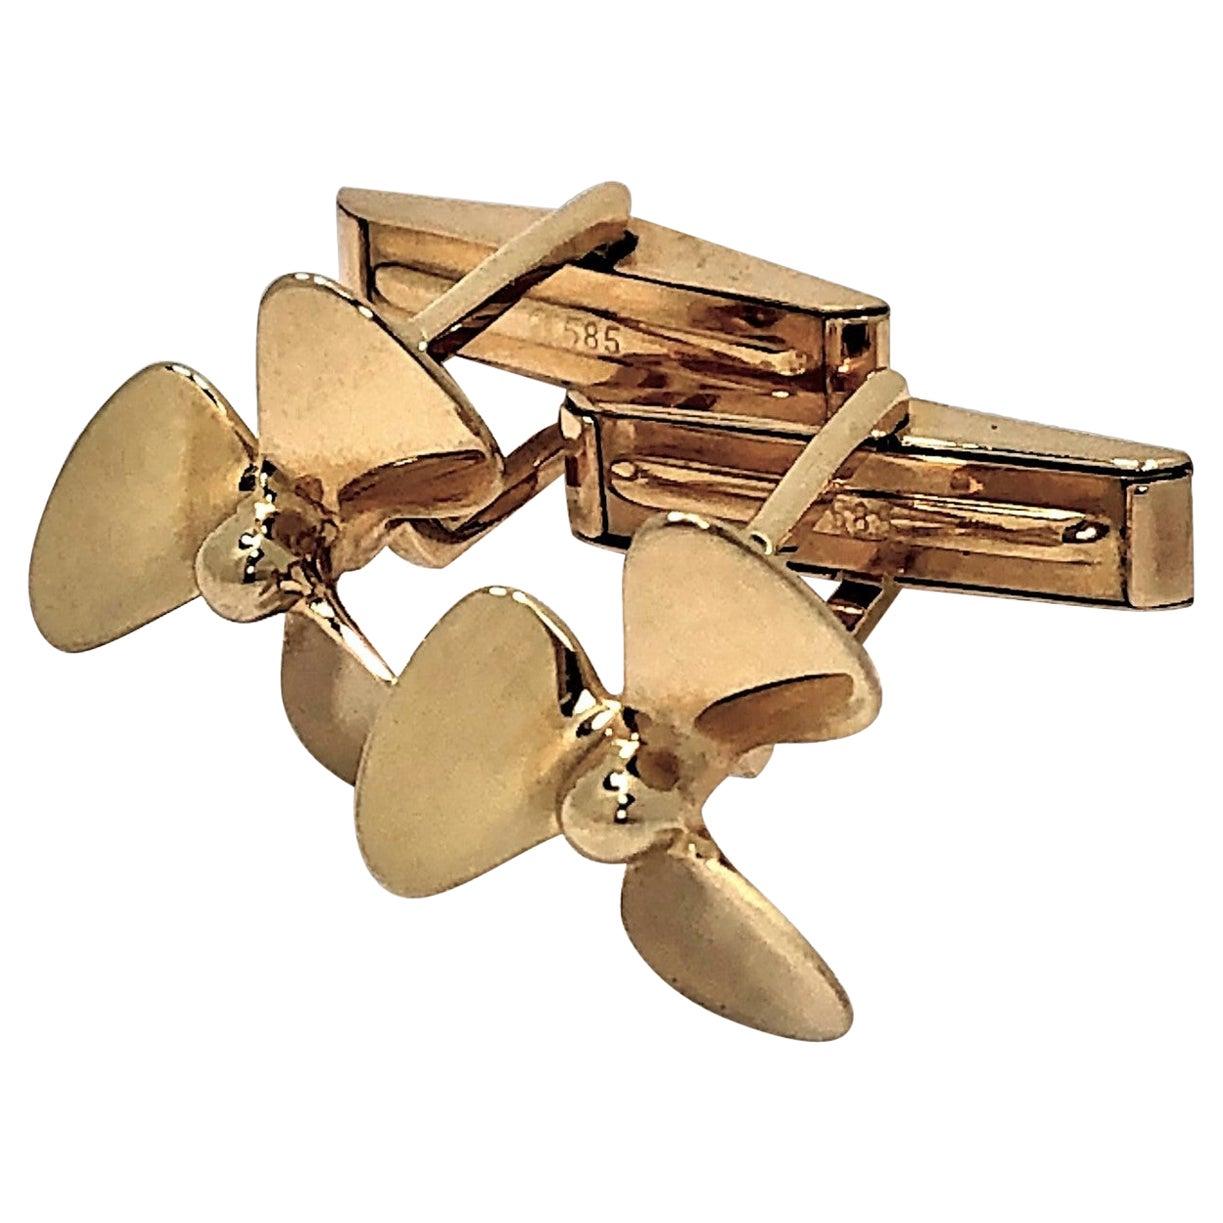 Tiffany & Co. Gold Propeller Cuff Links